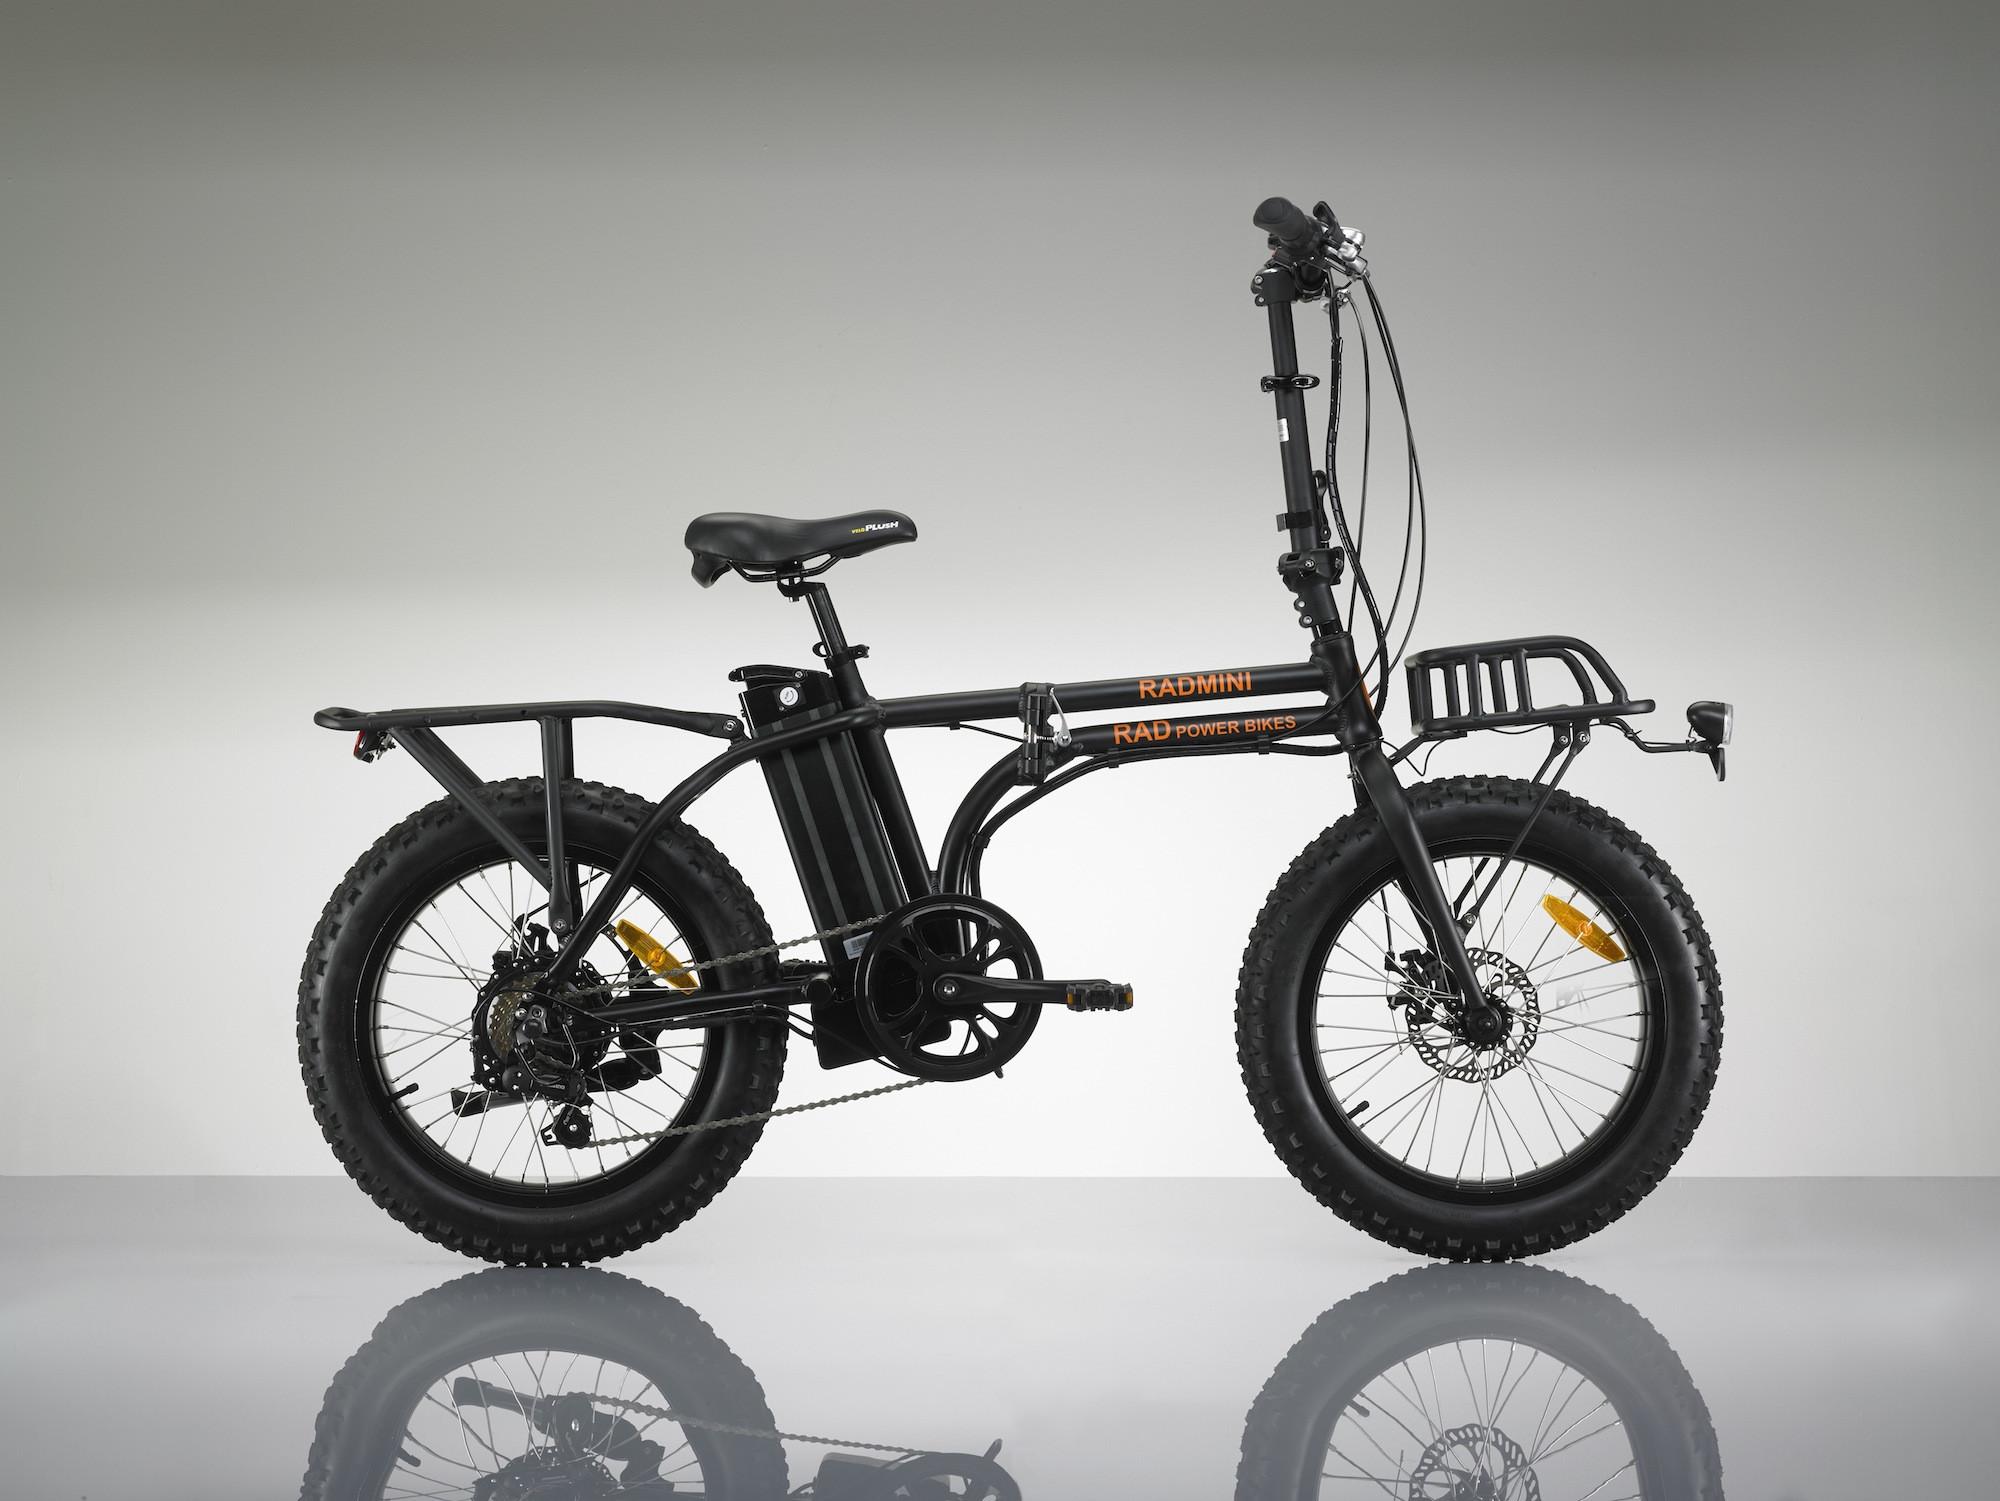 Radmini Electric Bike The Coolector